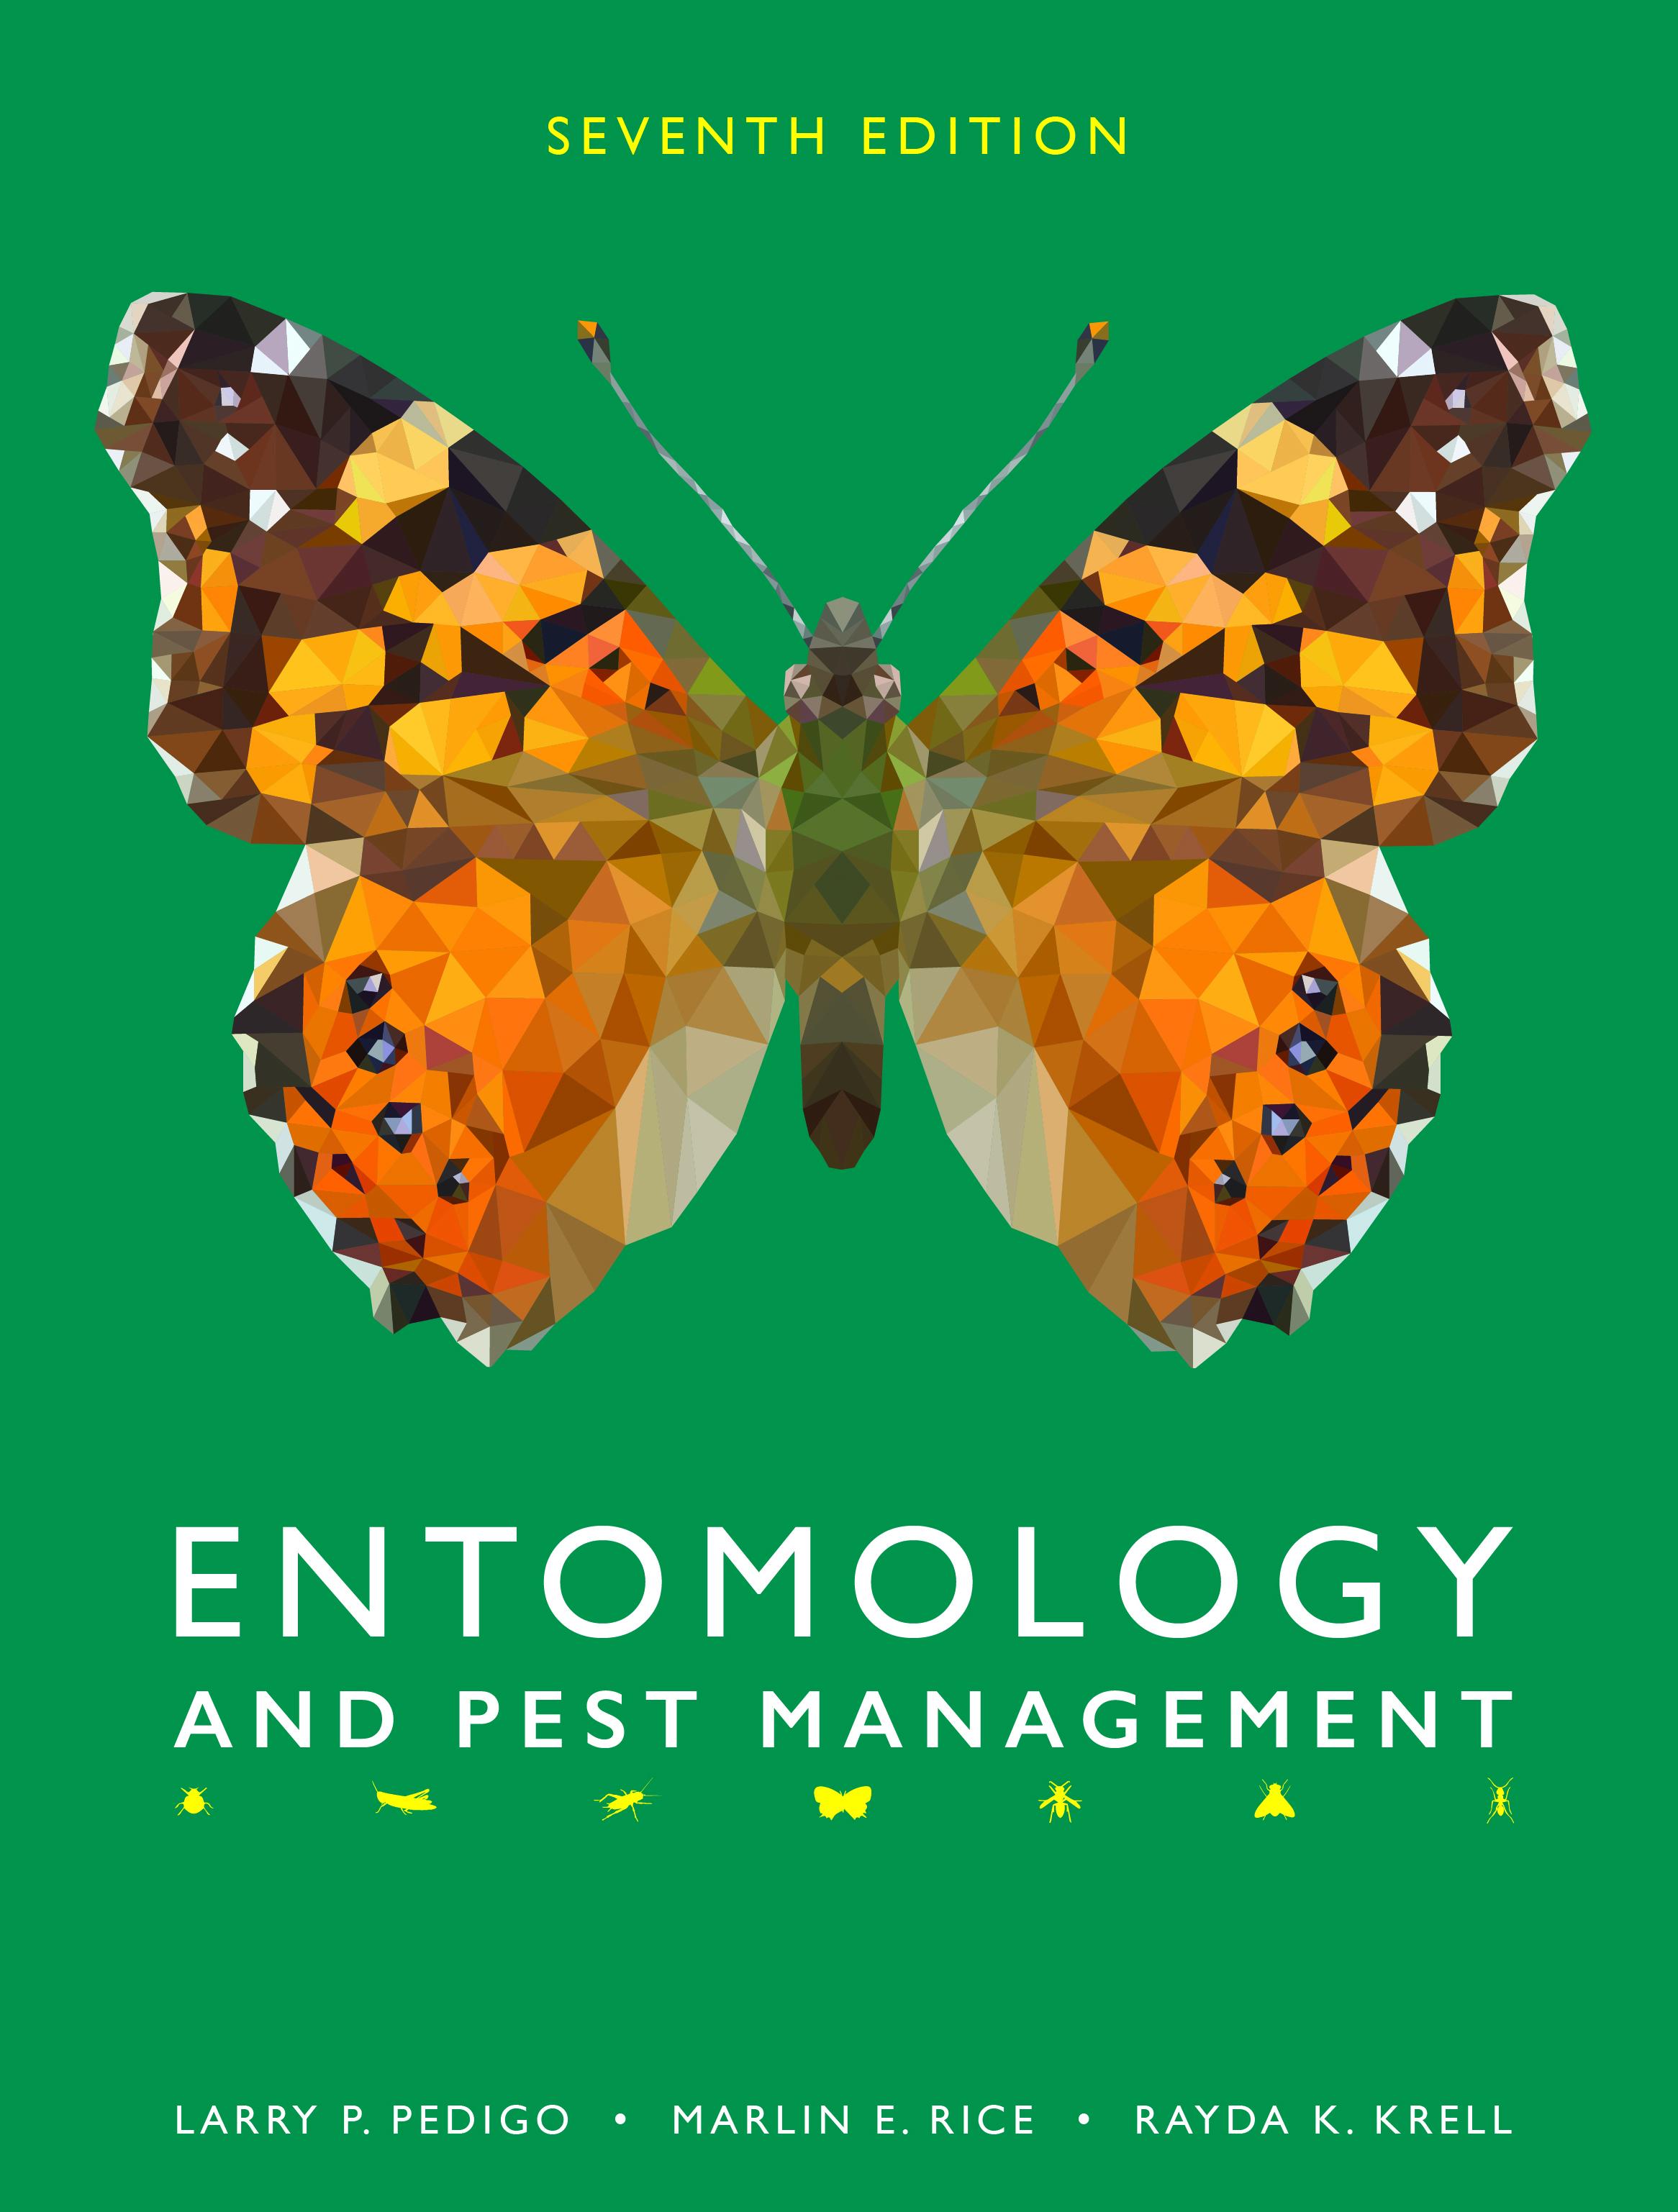 Entomology and Pest Management: Seventh Edition by Larry P. Pedigo, Marlin E. Rice, Rayda K. Krell